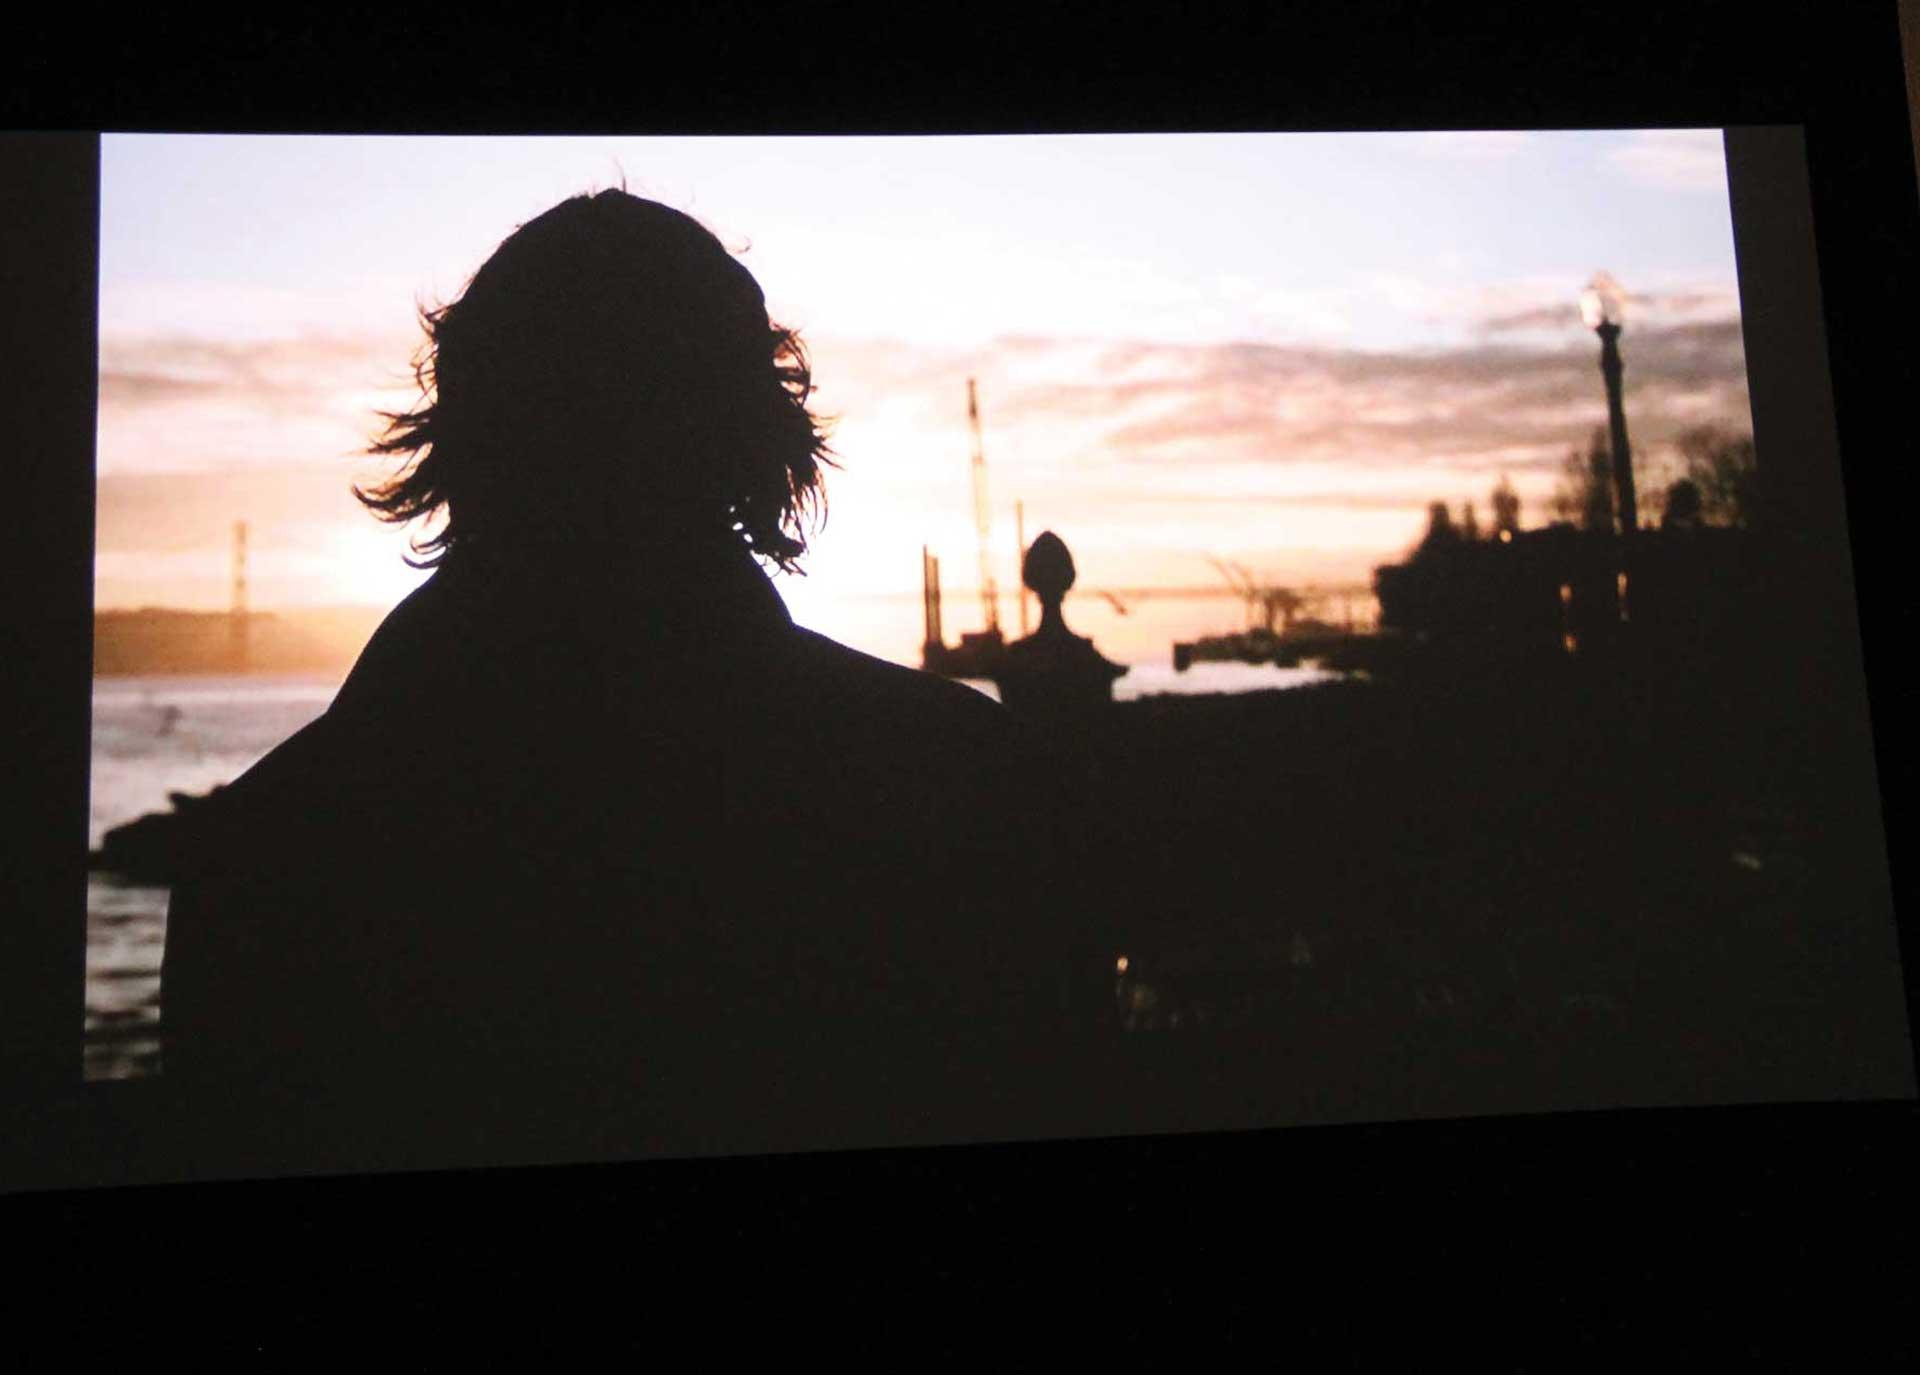 """Film of Disquiet"", by João Botelho"